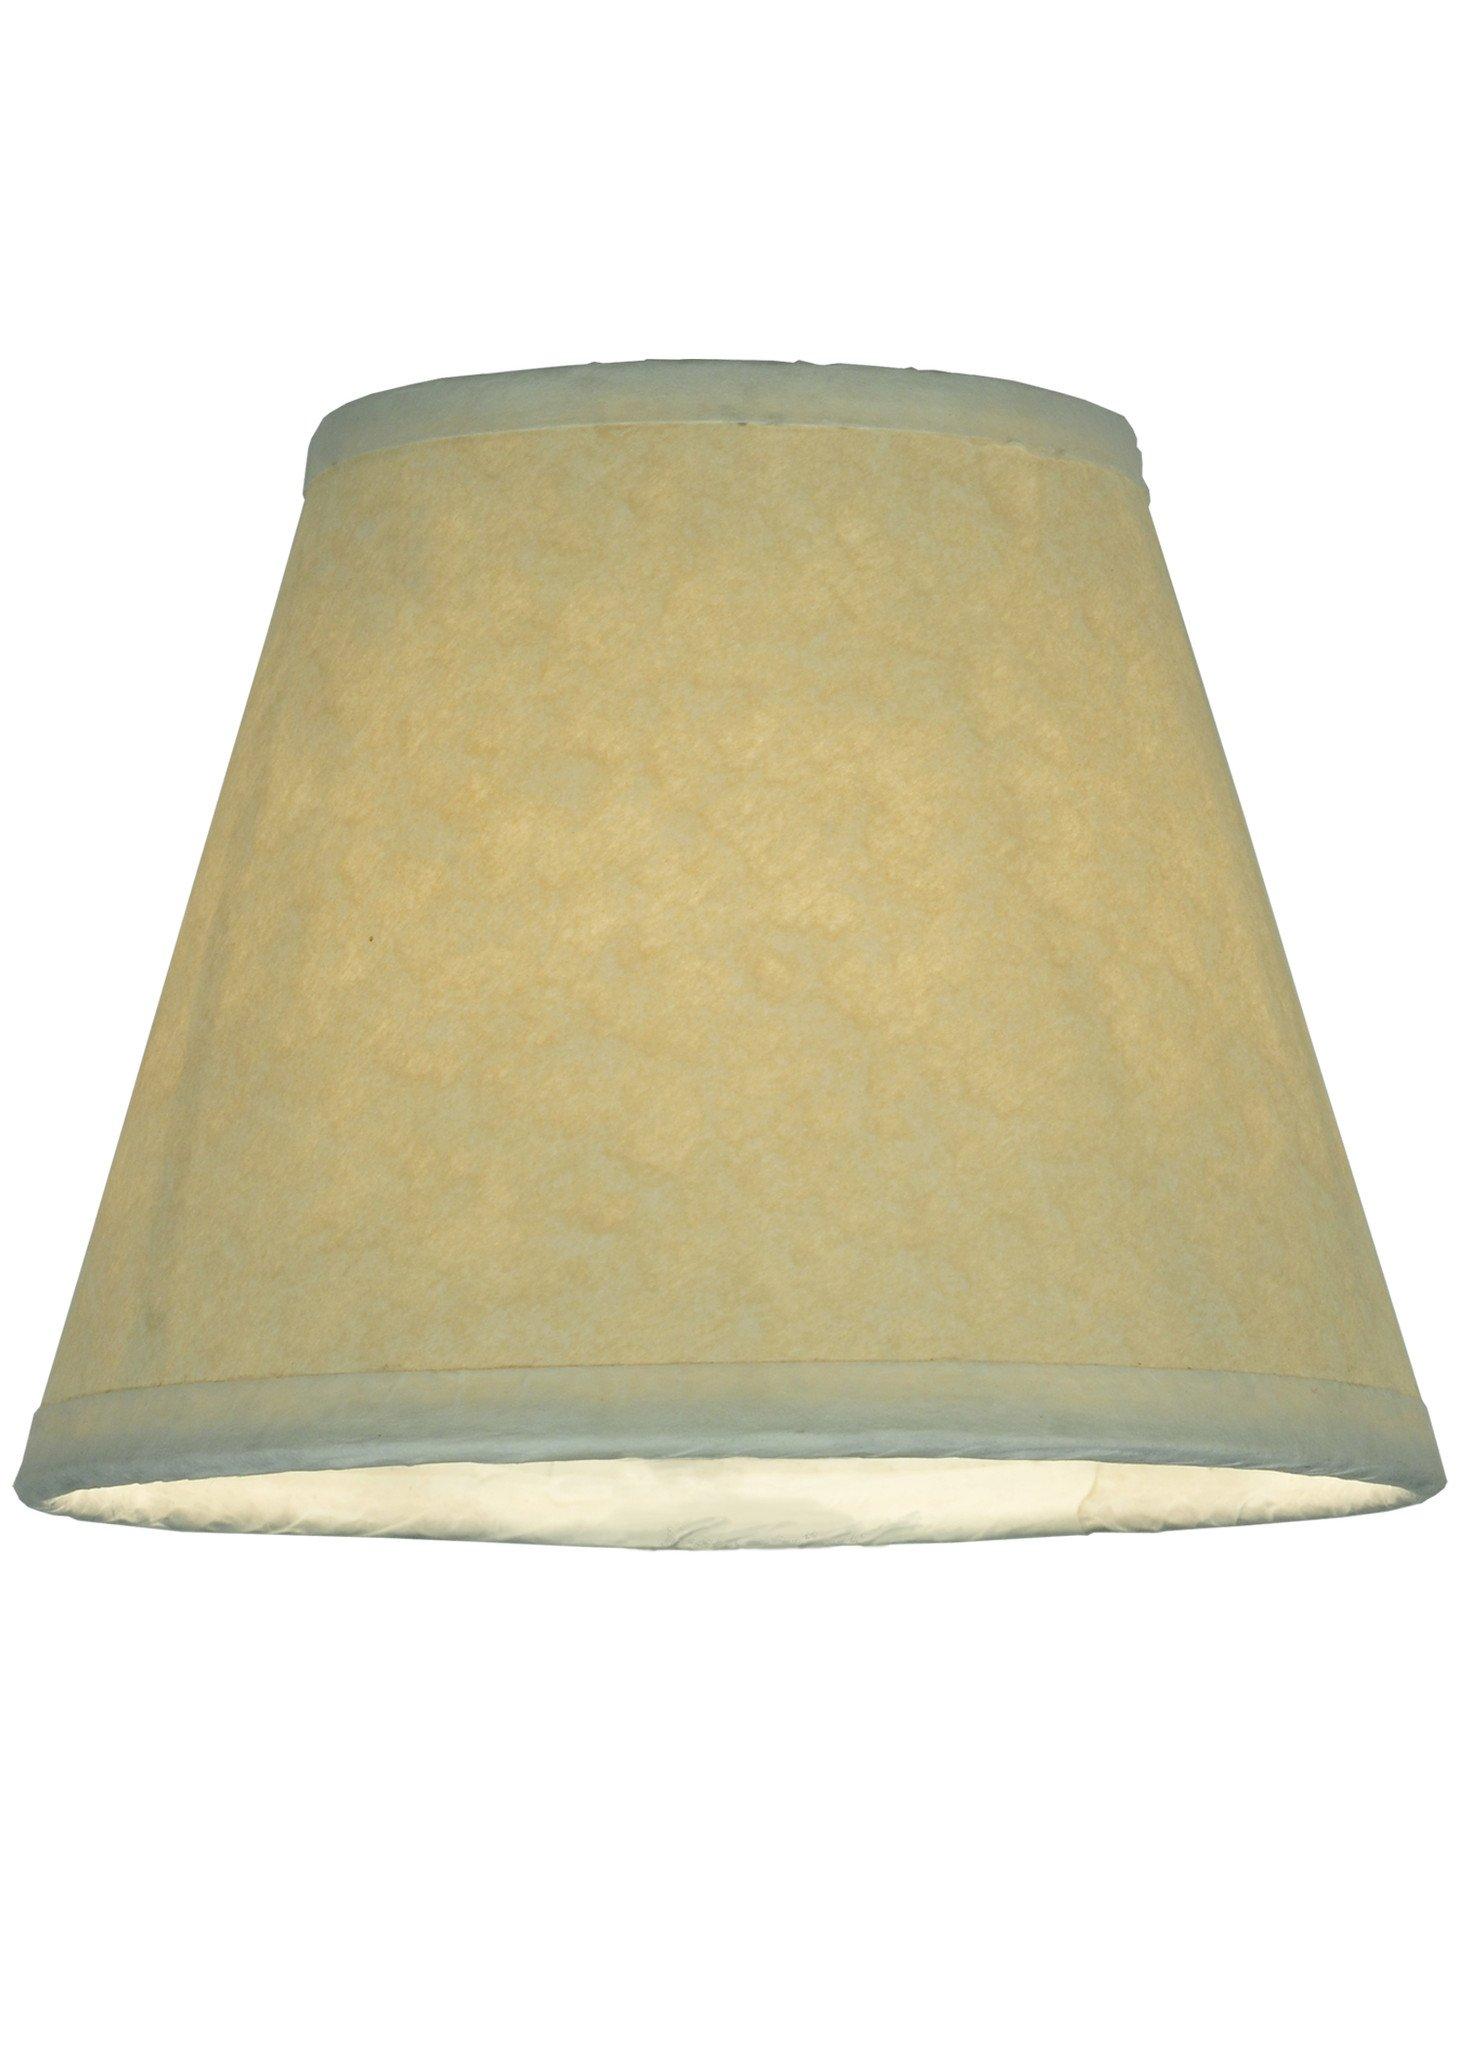 5 Inch W X 4 Inch H Aged Celadon Beige Parchment Shade , Shade Only , Meyda